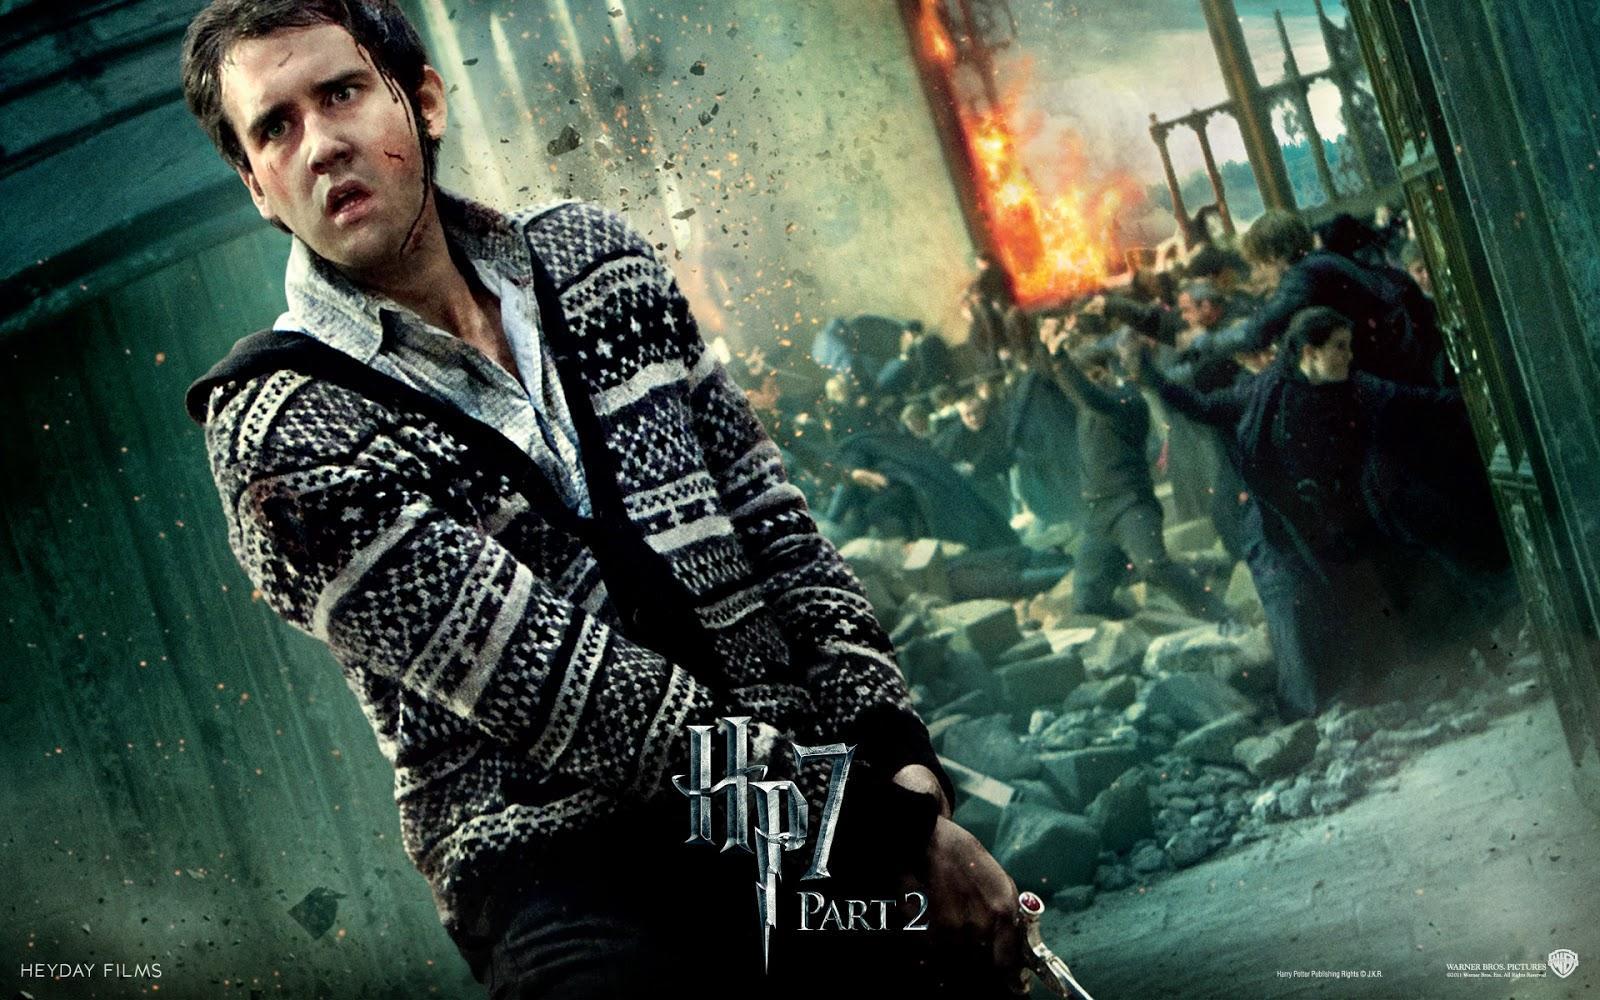 http://2.bp.blogspot.com/-6ckGwpalgIA/Tg3kOK1zRHI/AAAAAAAAGOw/xfAwIDClW9s/s1600/Harry-Potter-BlogHogwarts-HP7-Wallpaper-05.jpg